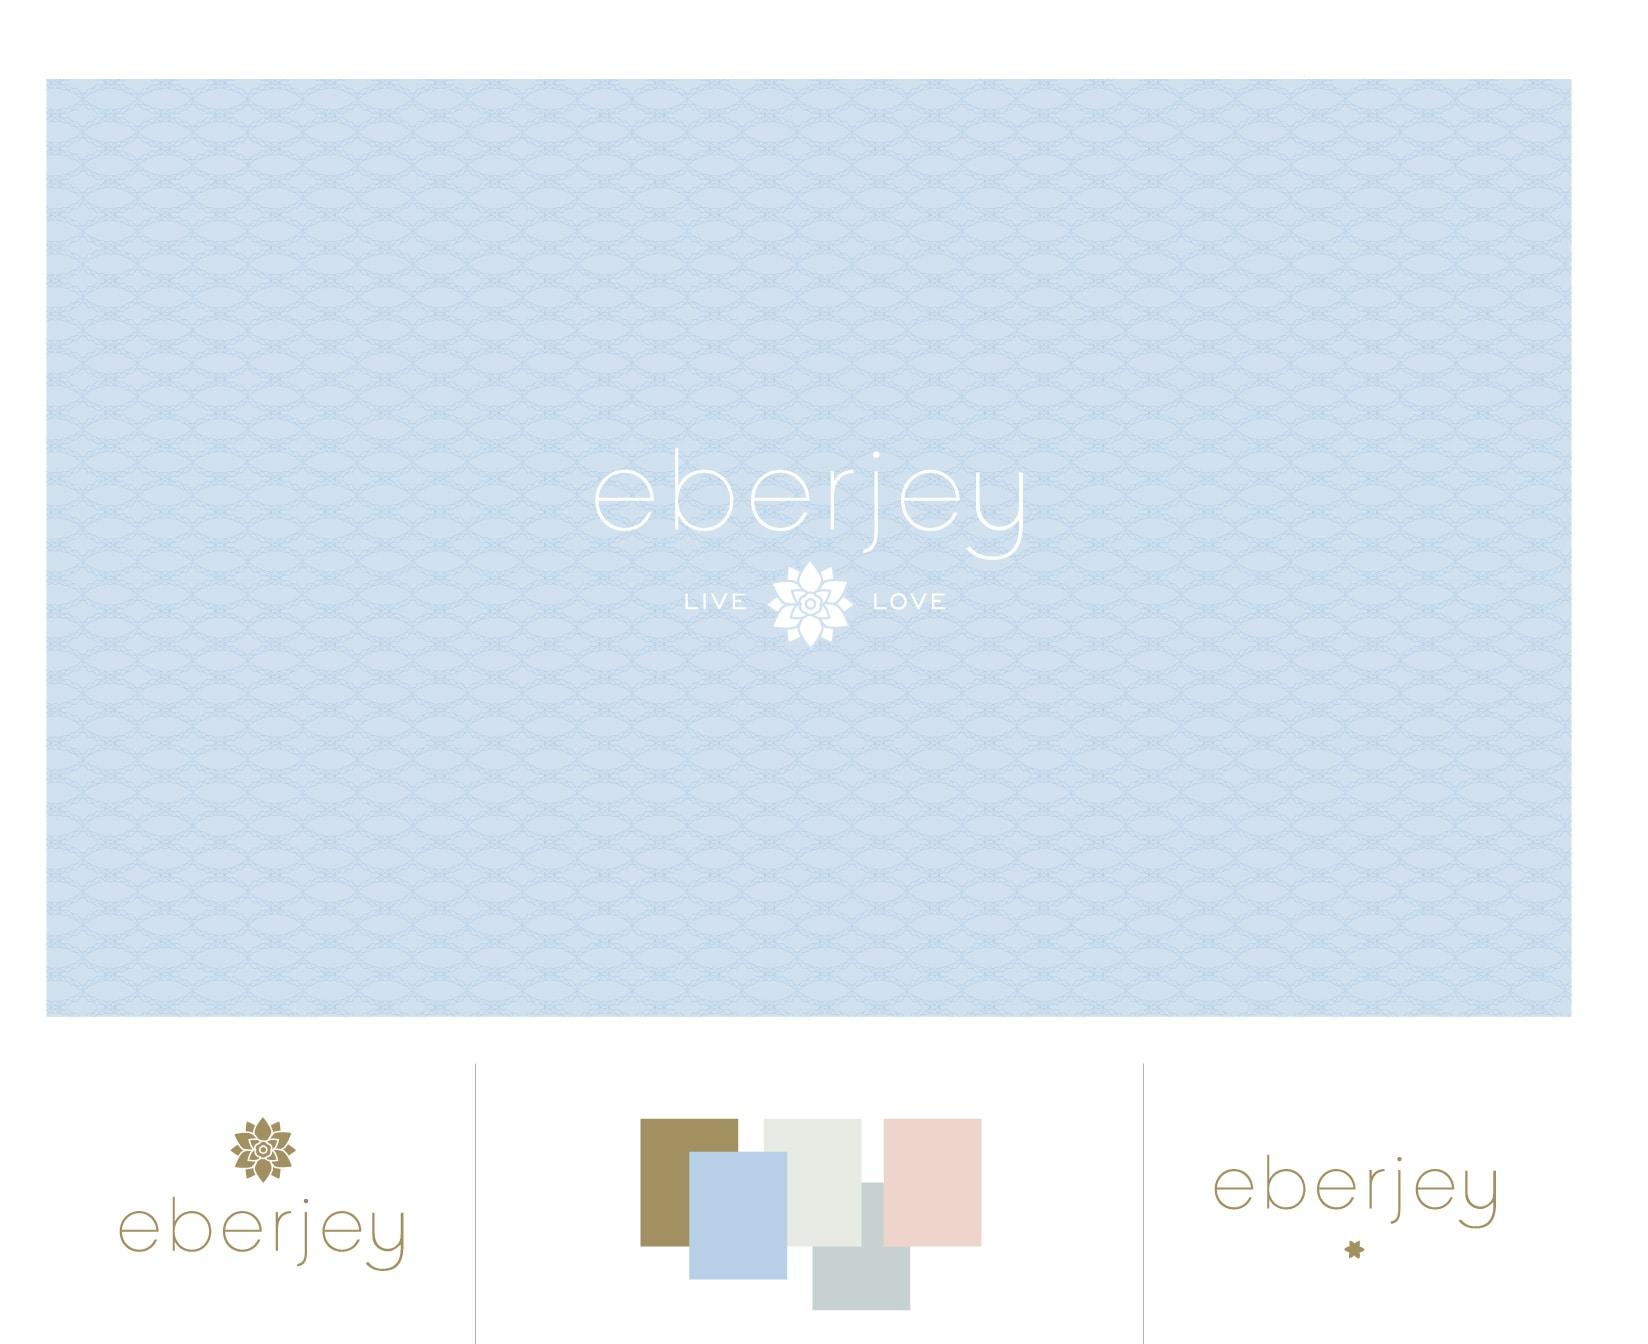 Eberjey_logo